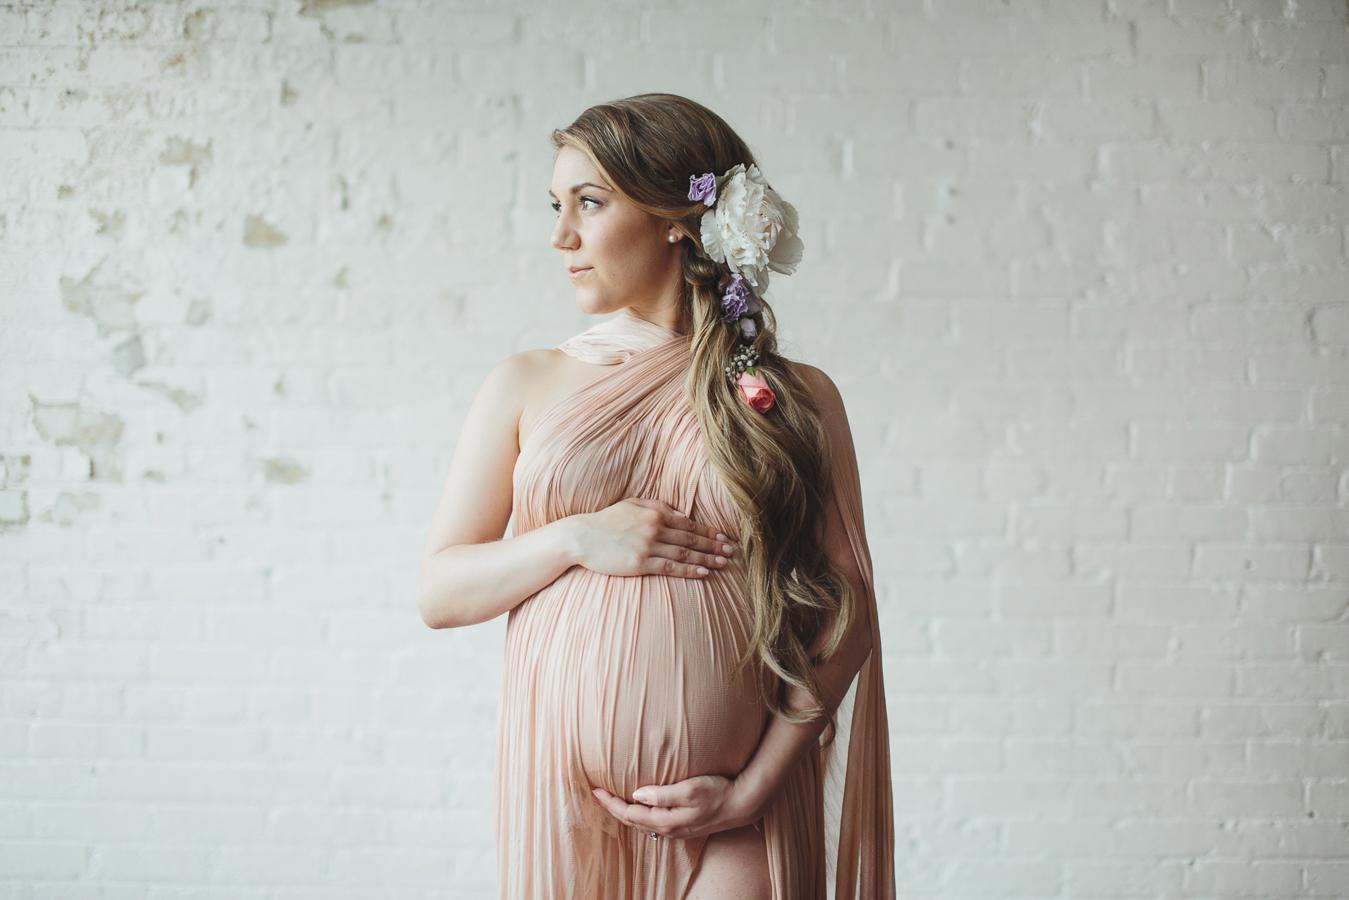 Maternity-Pregnancy-Photographer-Fashion-Lifestyle-20.jpg